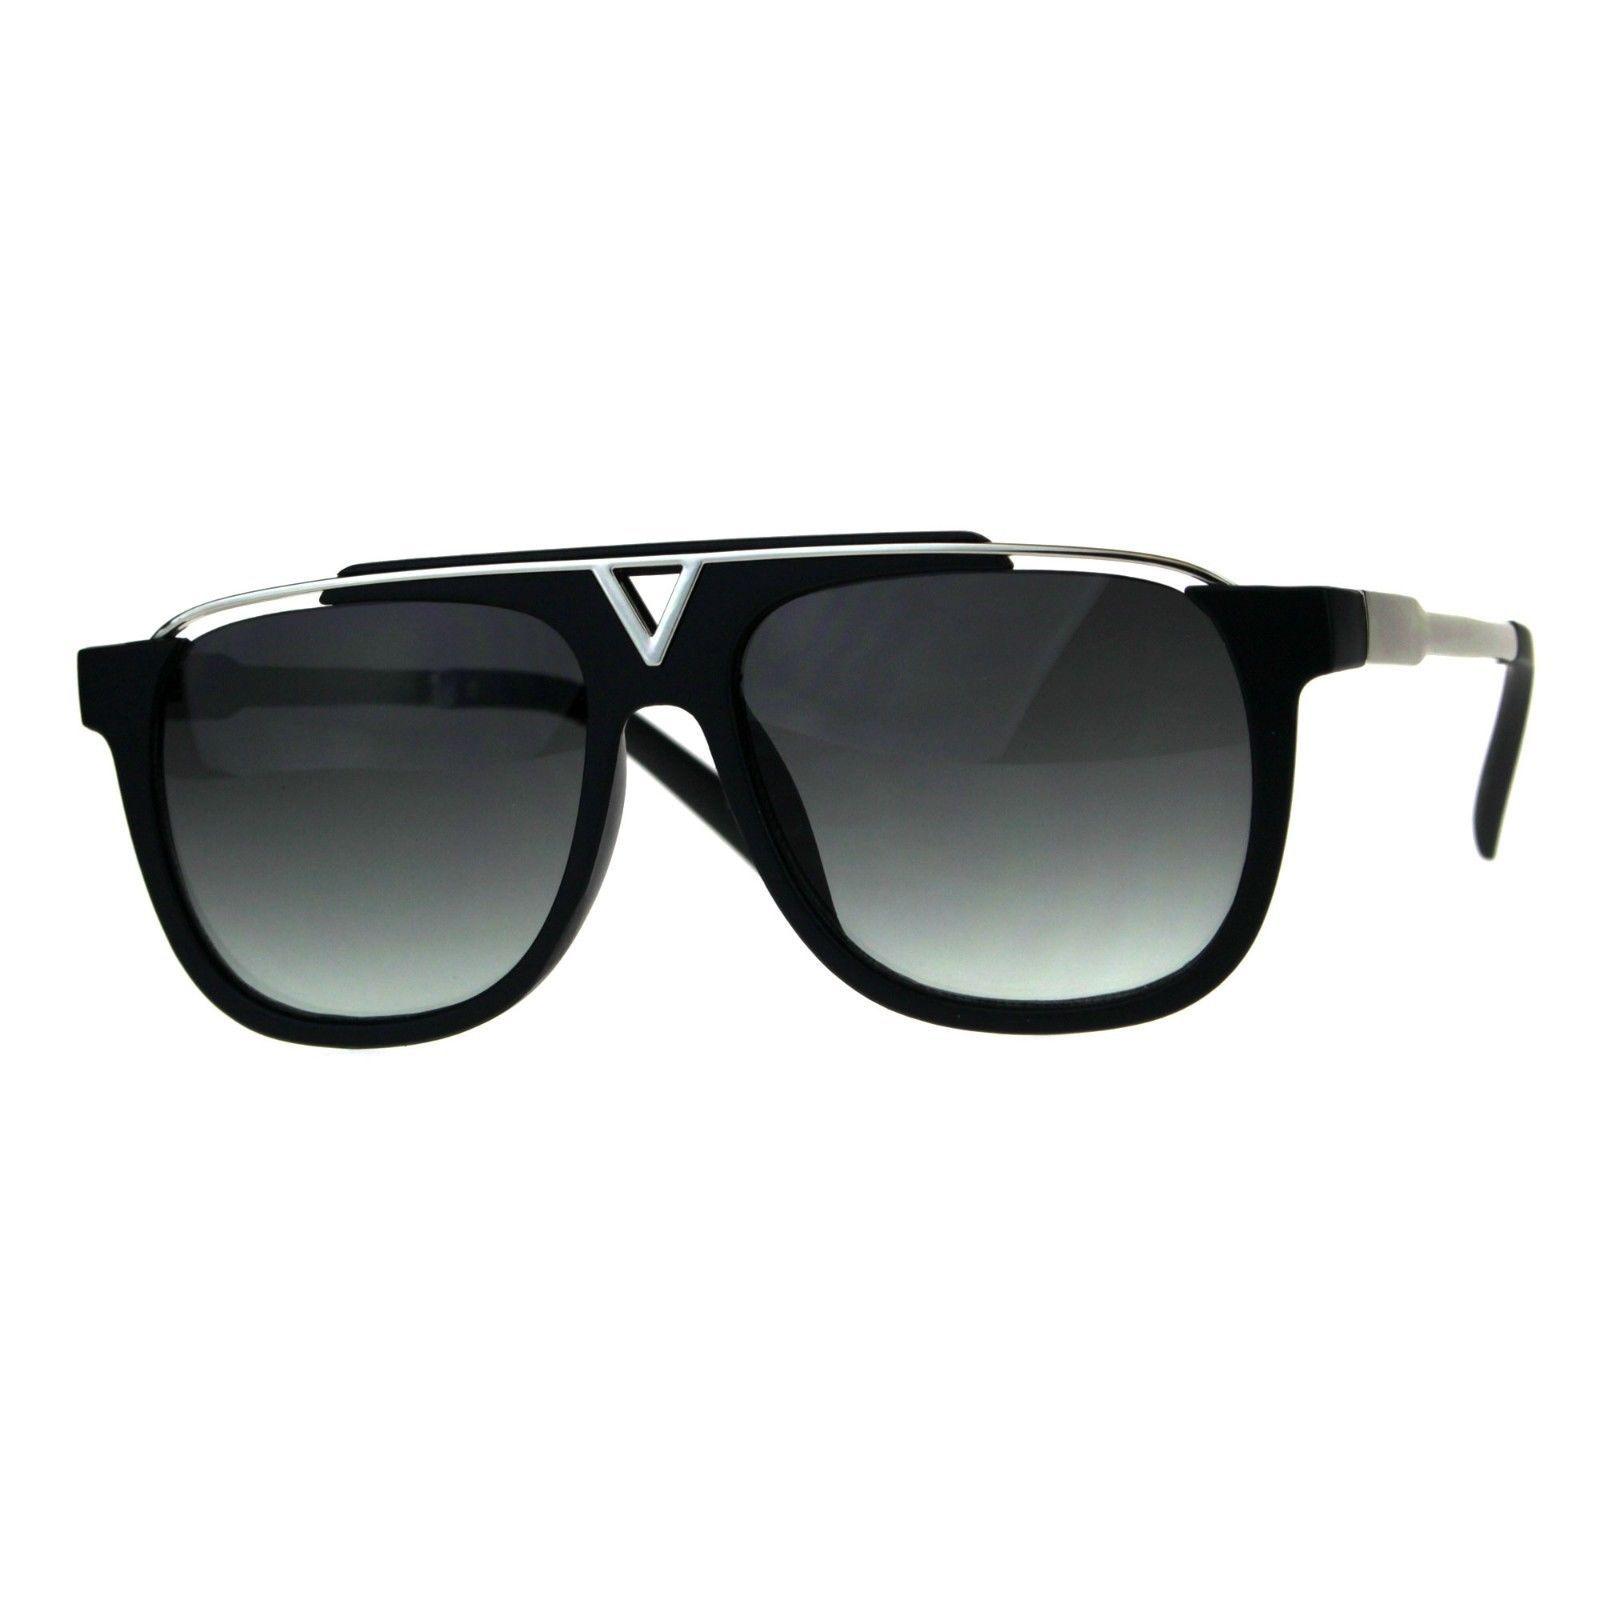 Retro Modern Sunglasses Unisex Fashion Del Metal Top Square Frame UV 400